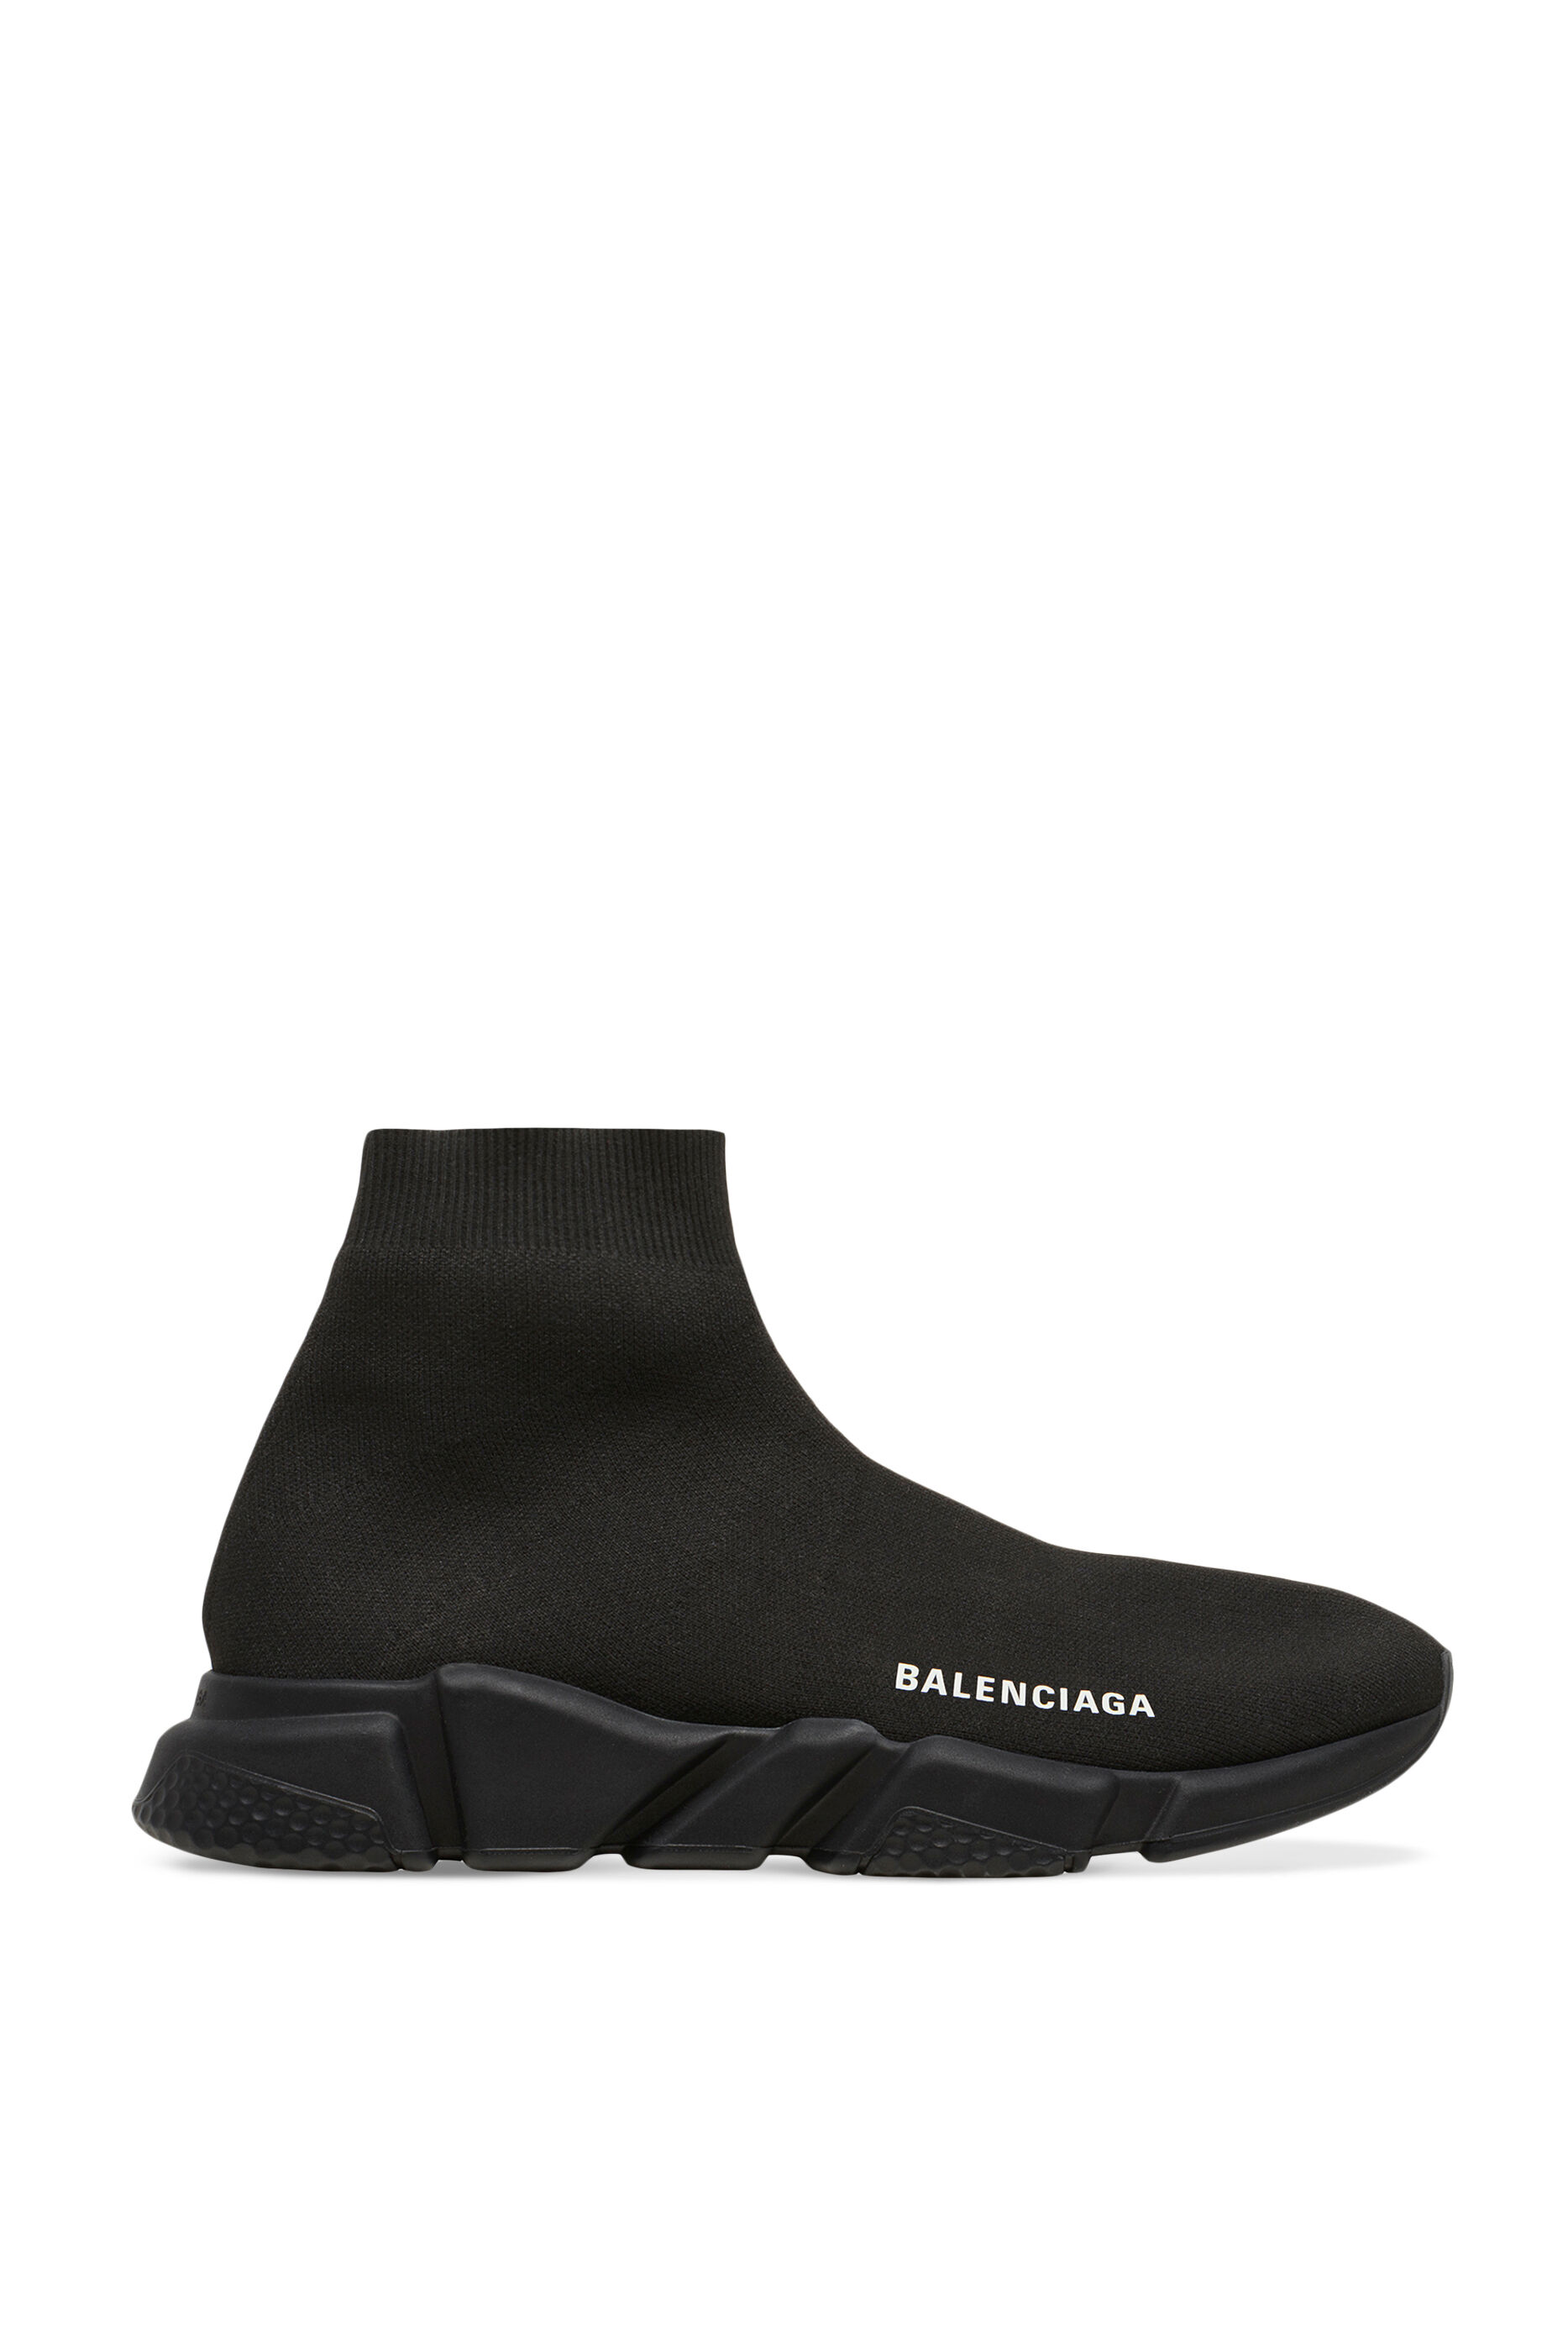 Buy Balenciaga Speed Sneakers for